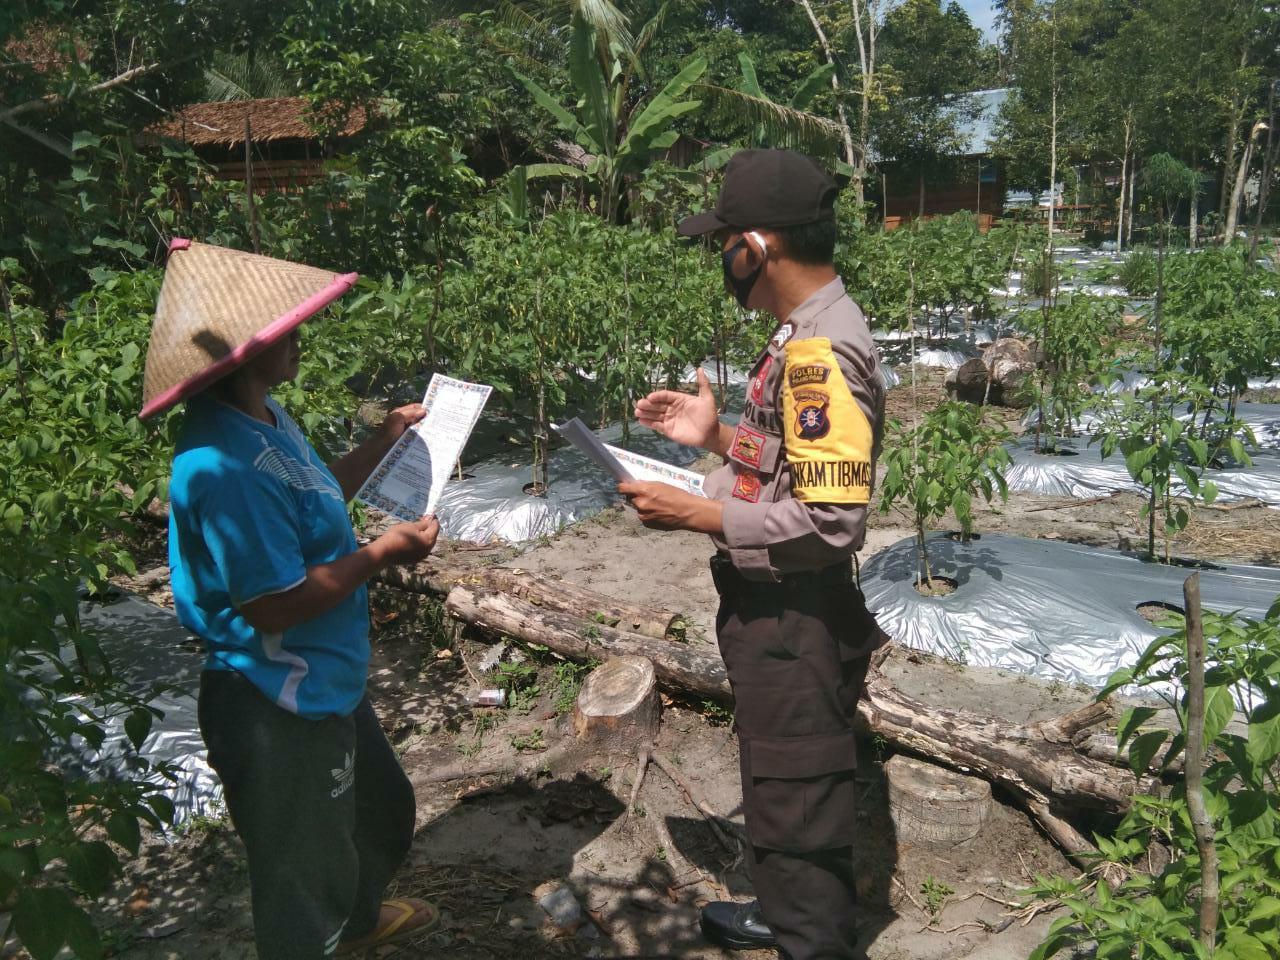 Cegah Penyebaran Virus Corona, Bhabinkamtibmas Desa Parahangan Sampaikan Sosialisasi